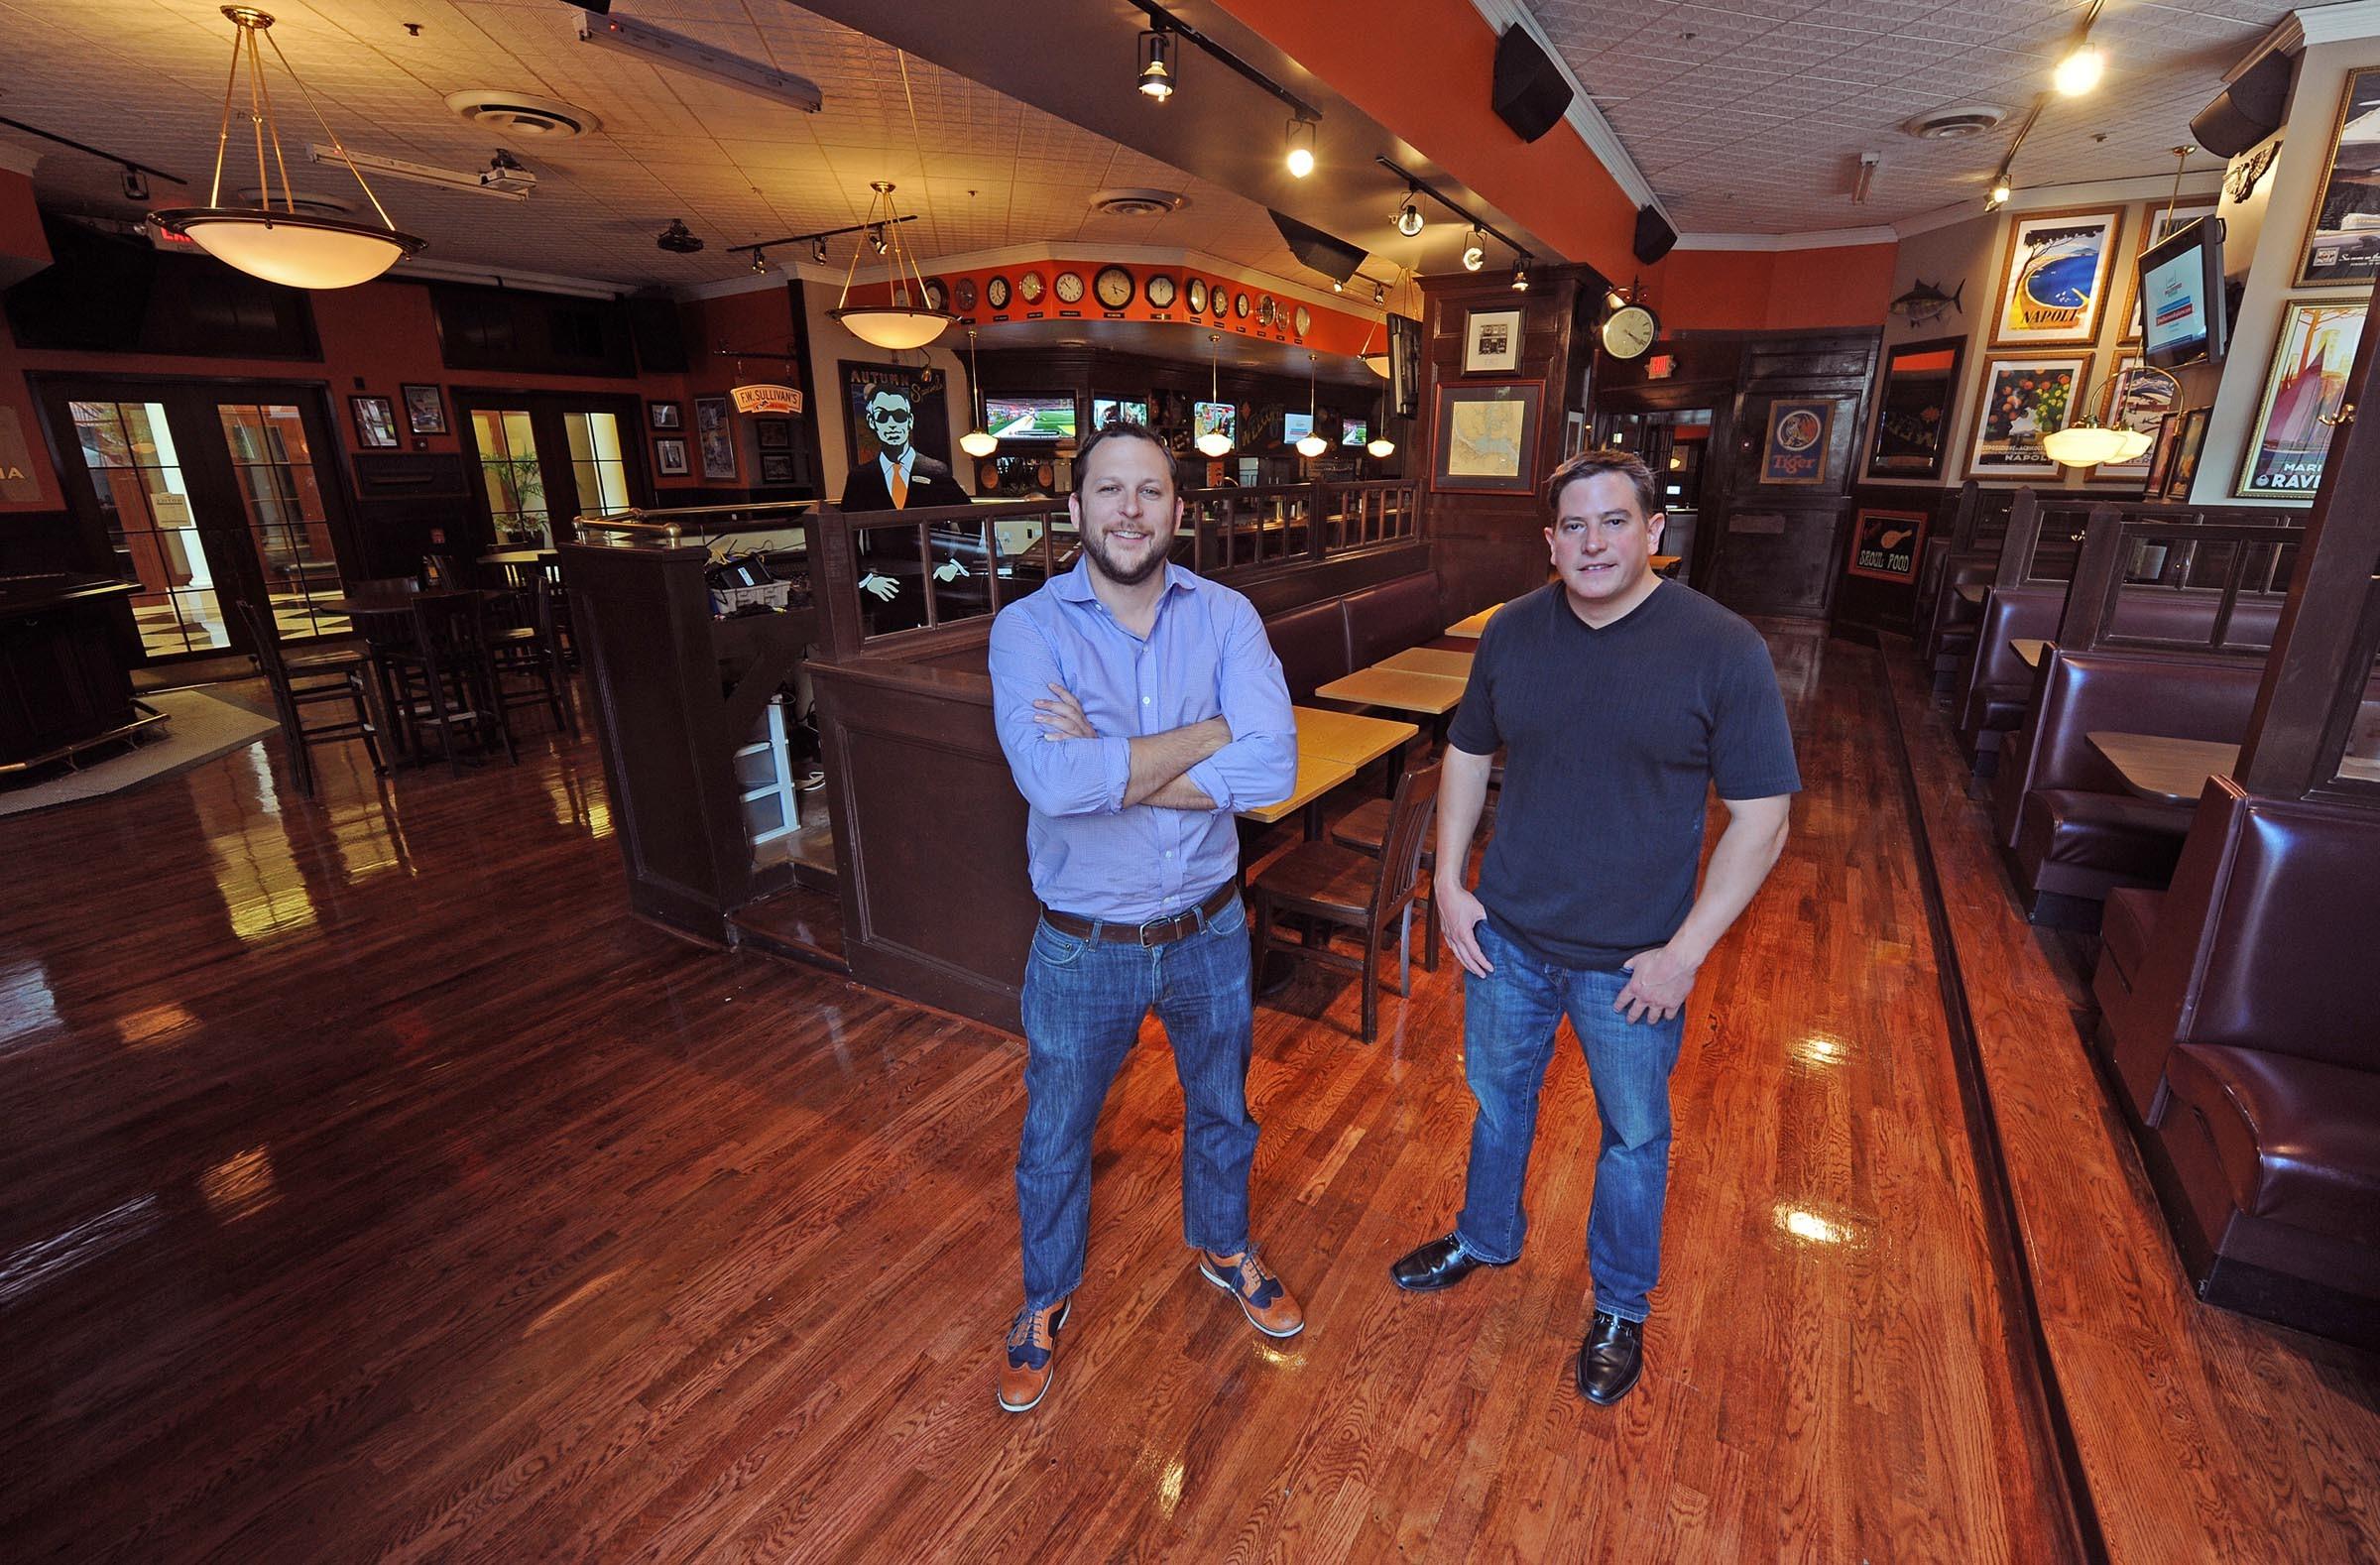 Jake Crocker and Hayden Fisher extend the F.W. Sullivan's brand into a canalside version, now open in the former Black Finn. - SCOTT ELMQUIST